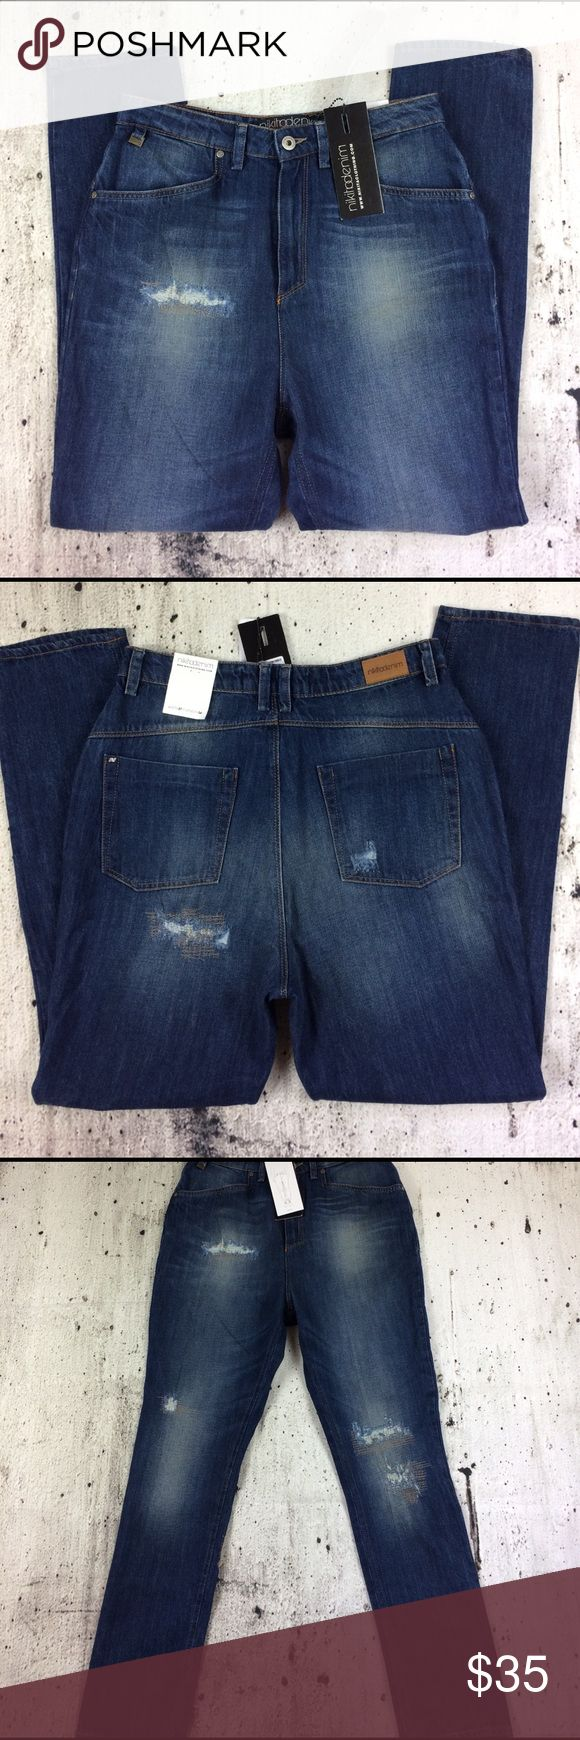 "Nikita the Amici boyfriend skinny jeans Nikita the Amici boyfriend skinny jeans 100% cotton inseam 34""rise 12"" Nikita Jeans Boyfriend"